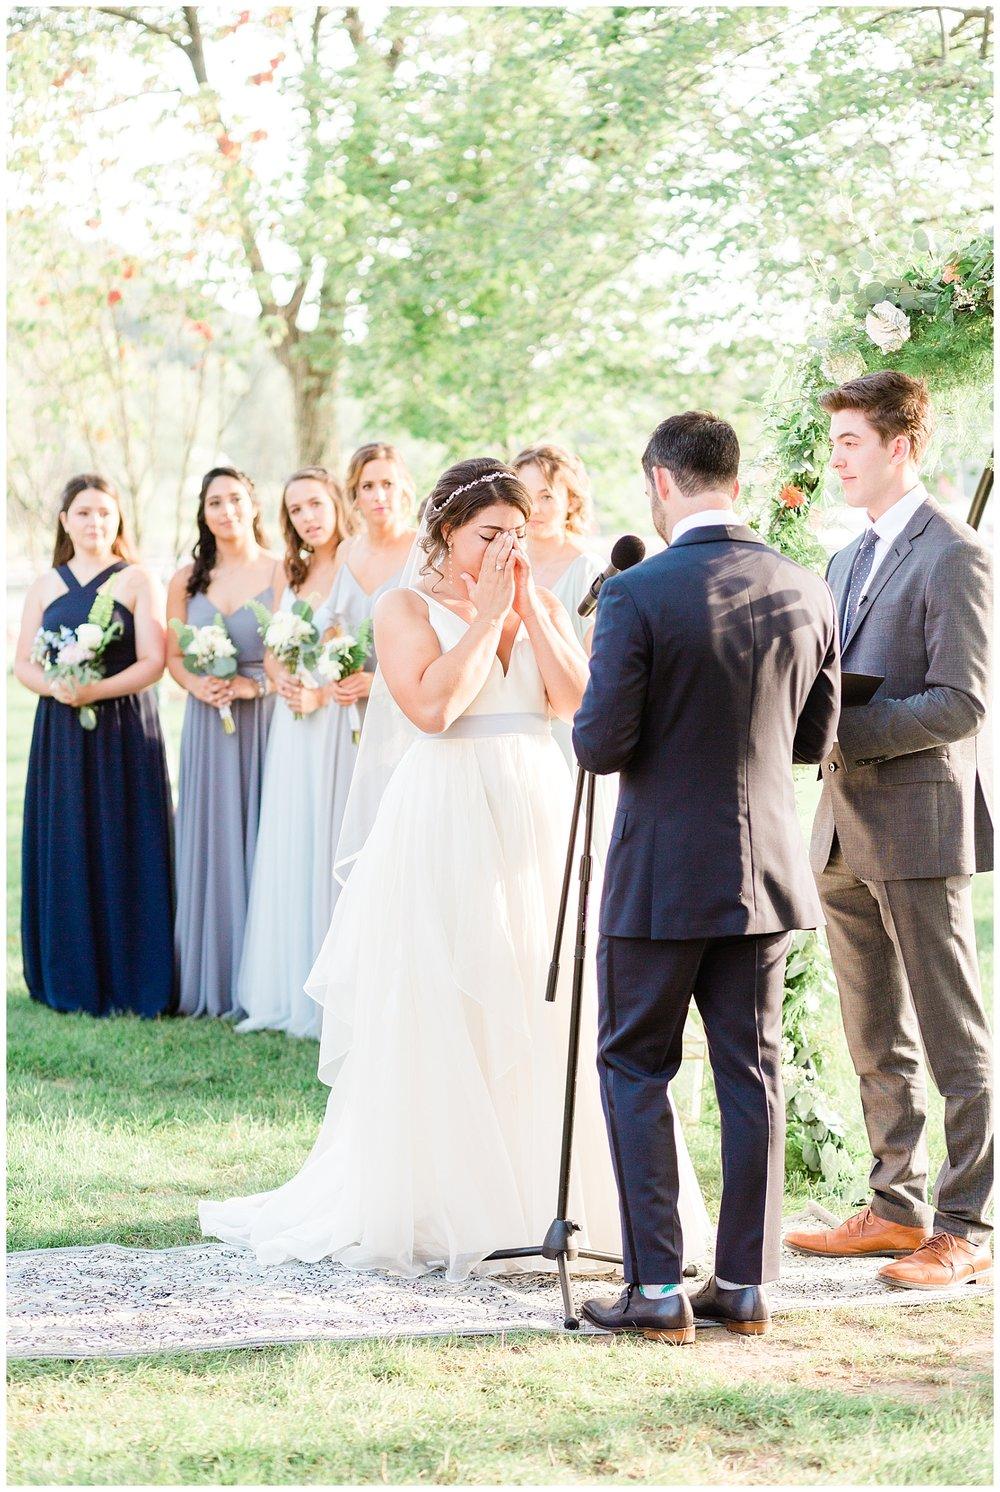 Indian-Trail-Club-Franklin-Lakes-NJ-Summer-Stylish-Wedding-Photographer-Photo-_0162.jpg